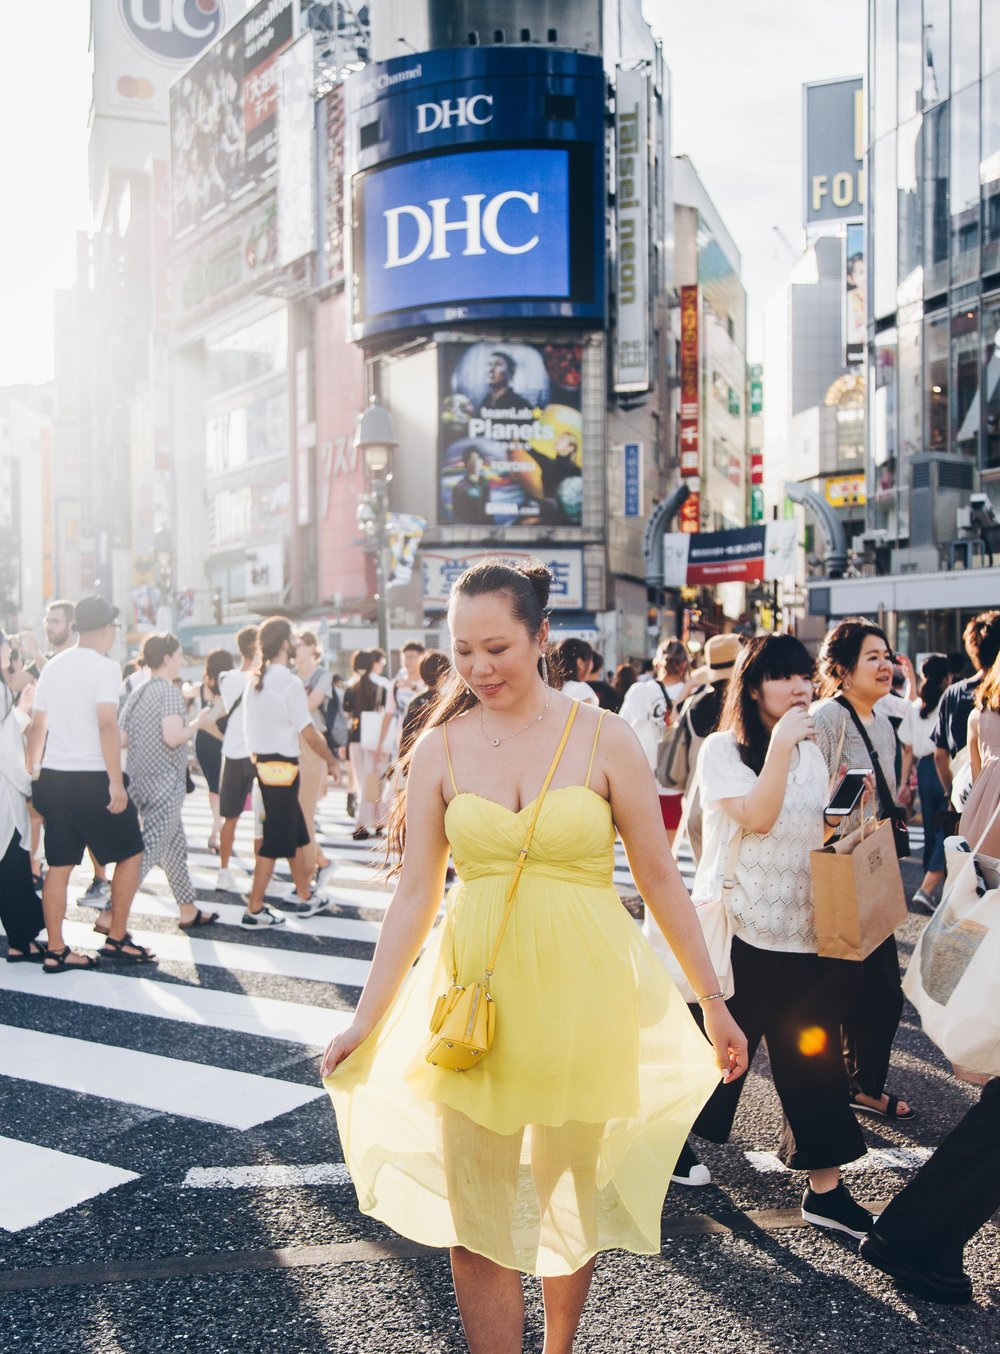 client traveller photo in japan 27.jpg